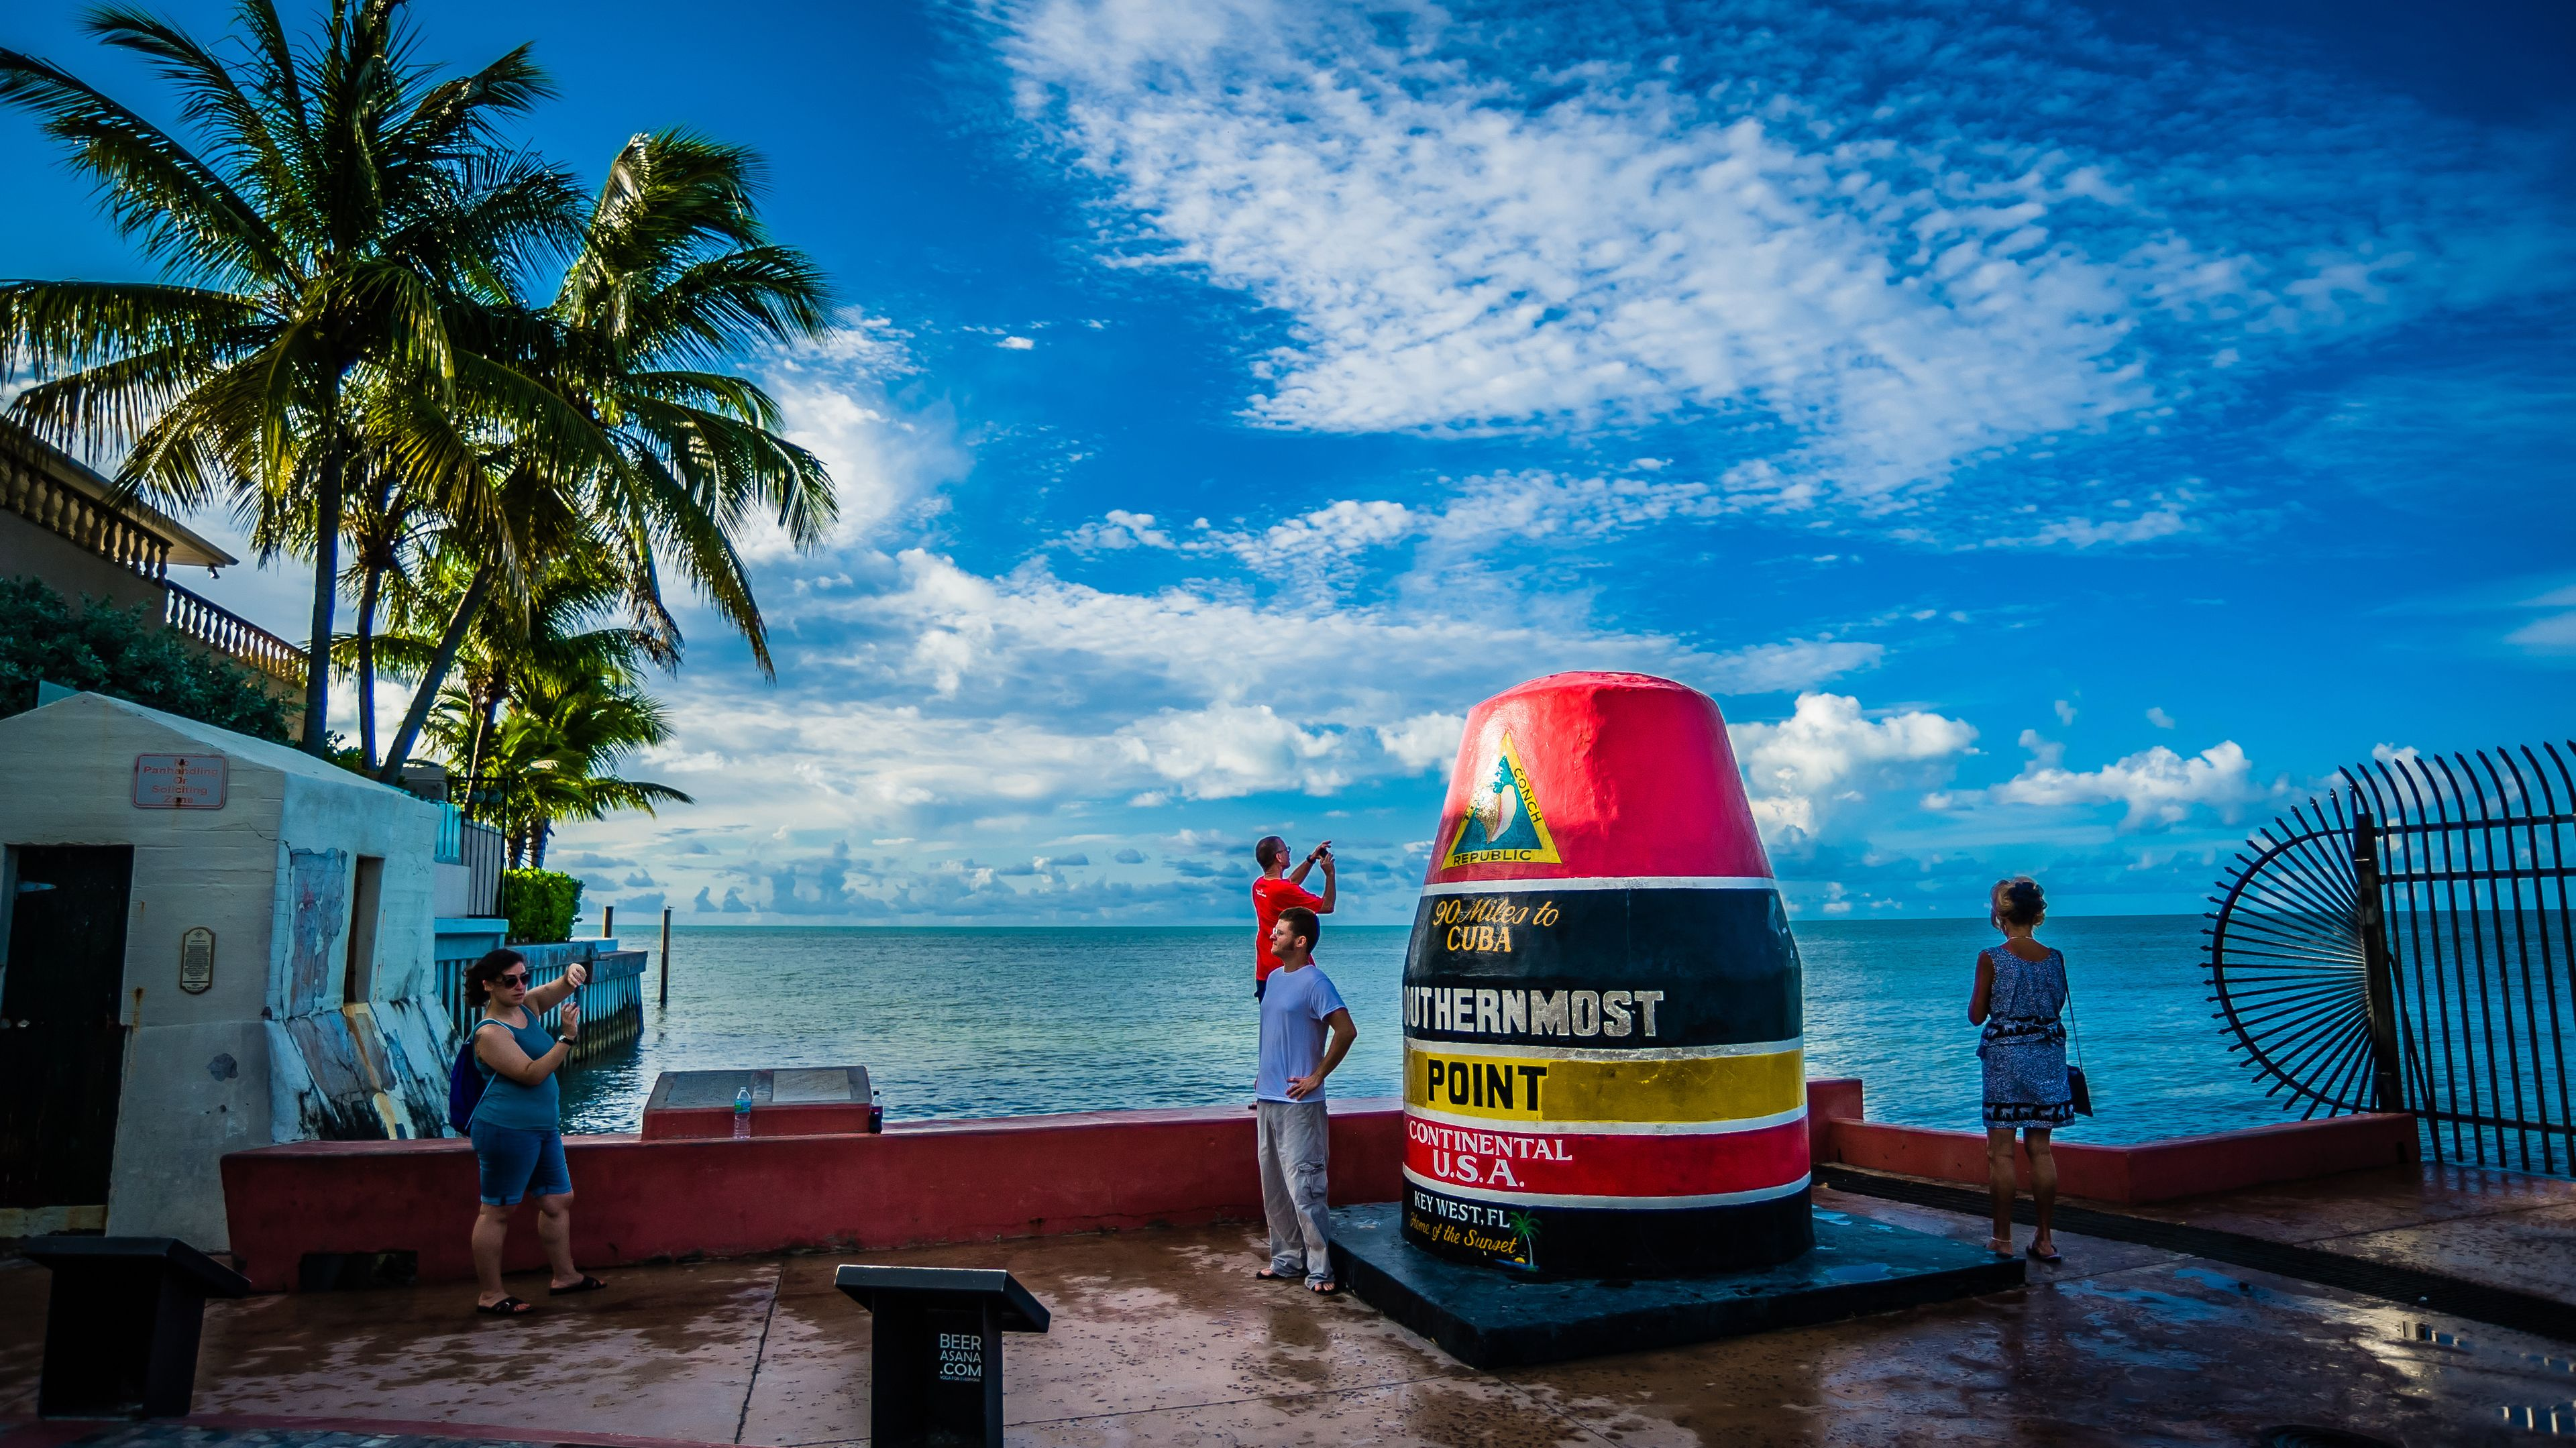 Key West Express Day Trip from Miami